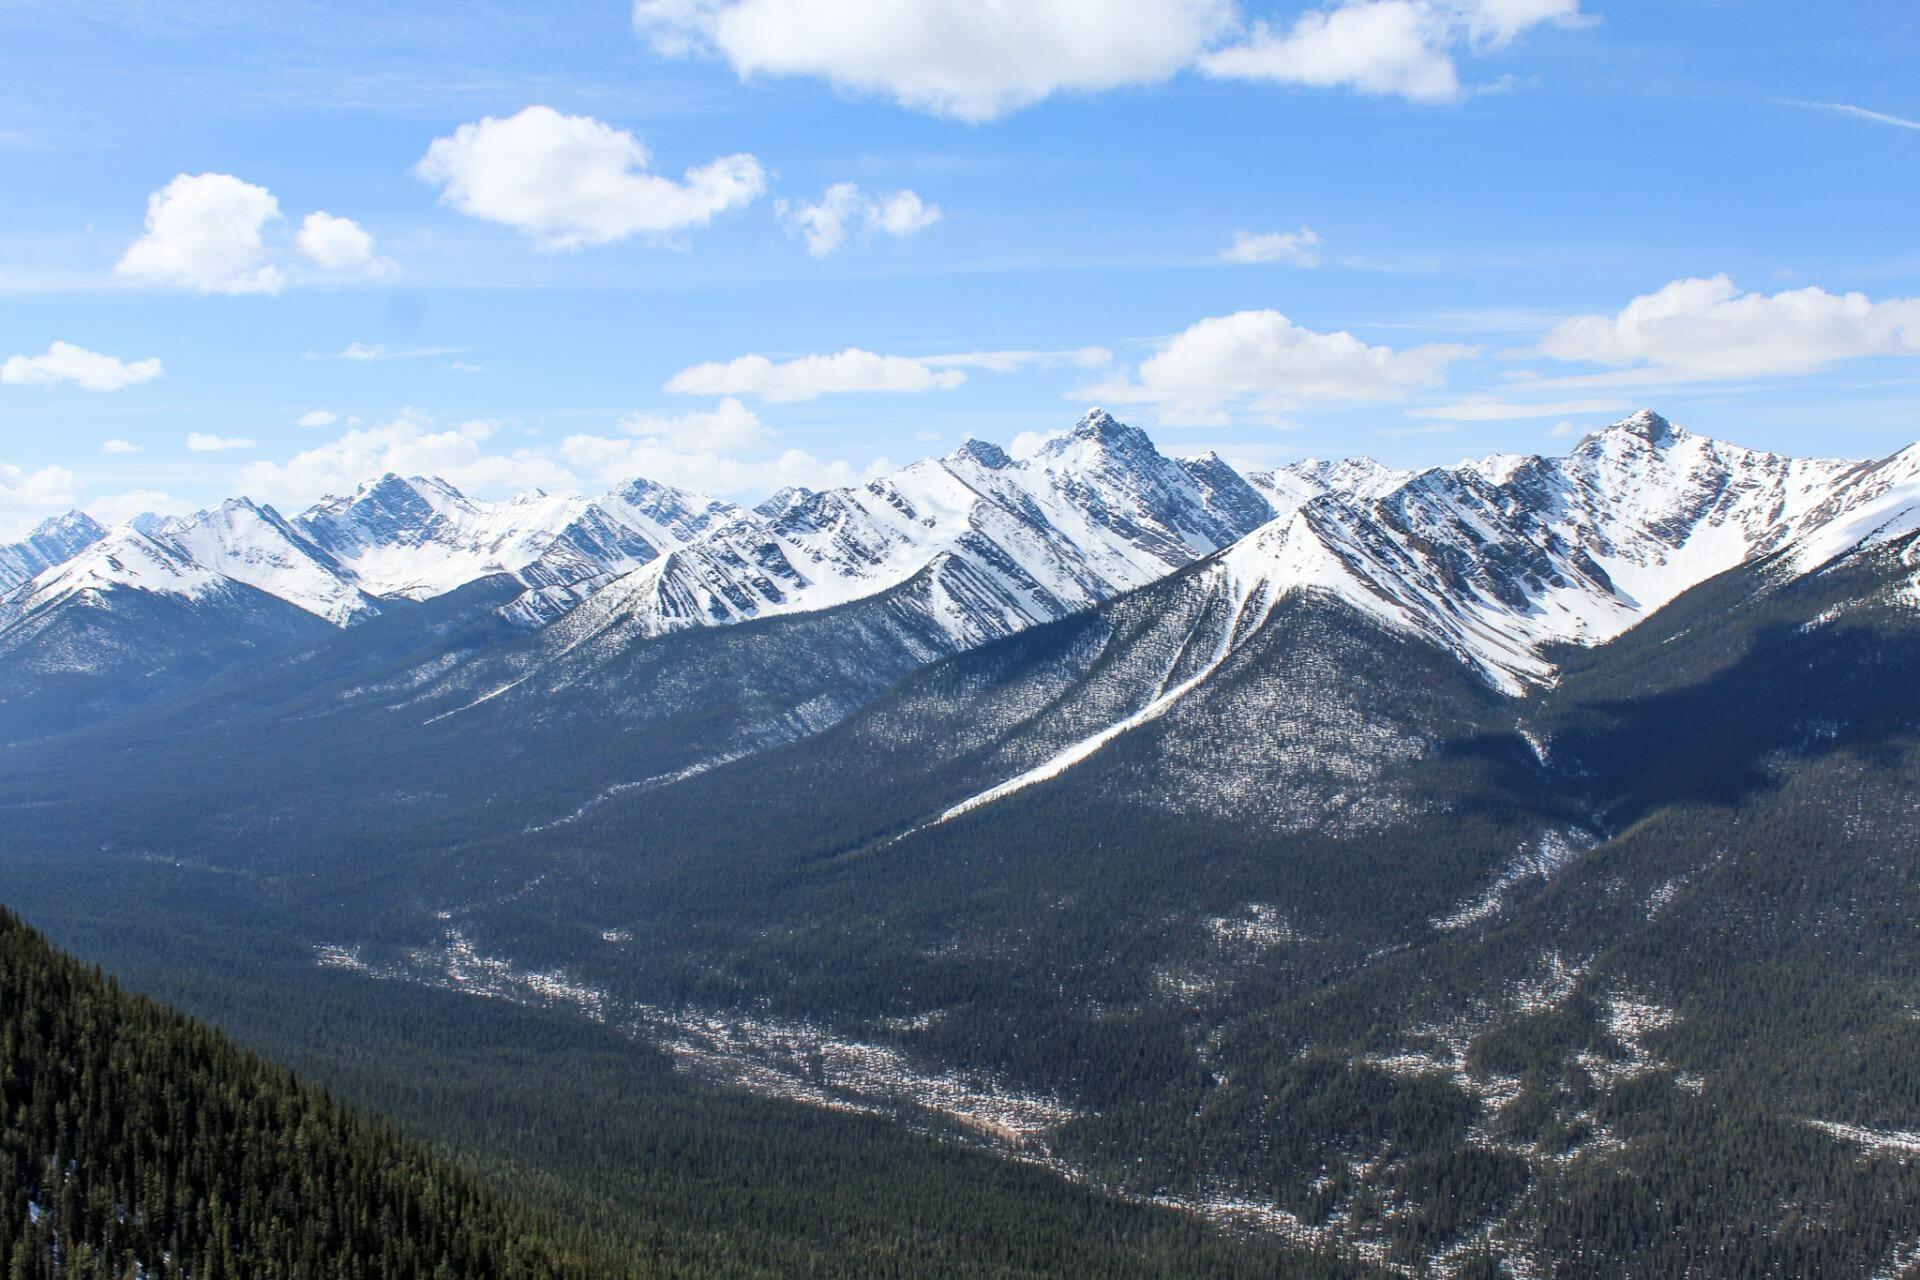 Banff National Park from the gondola